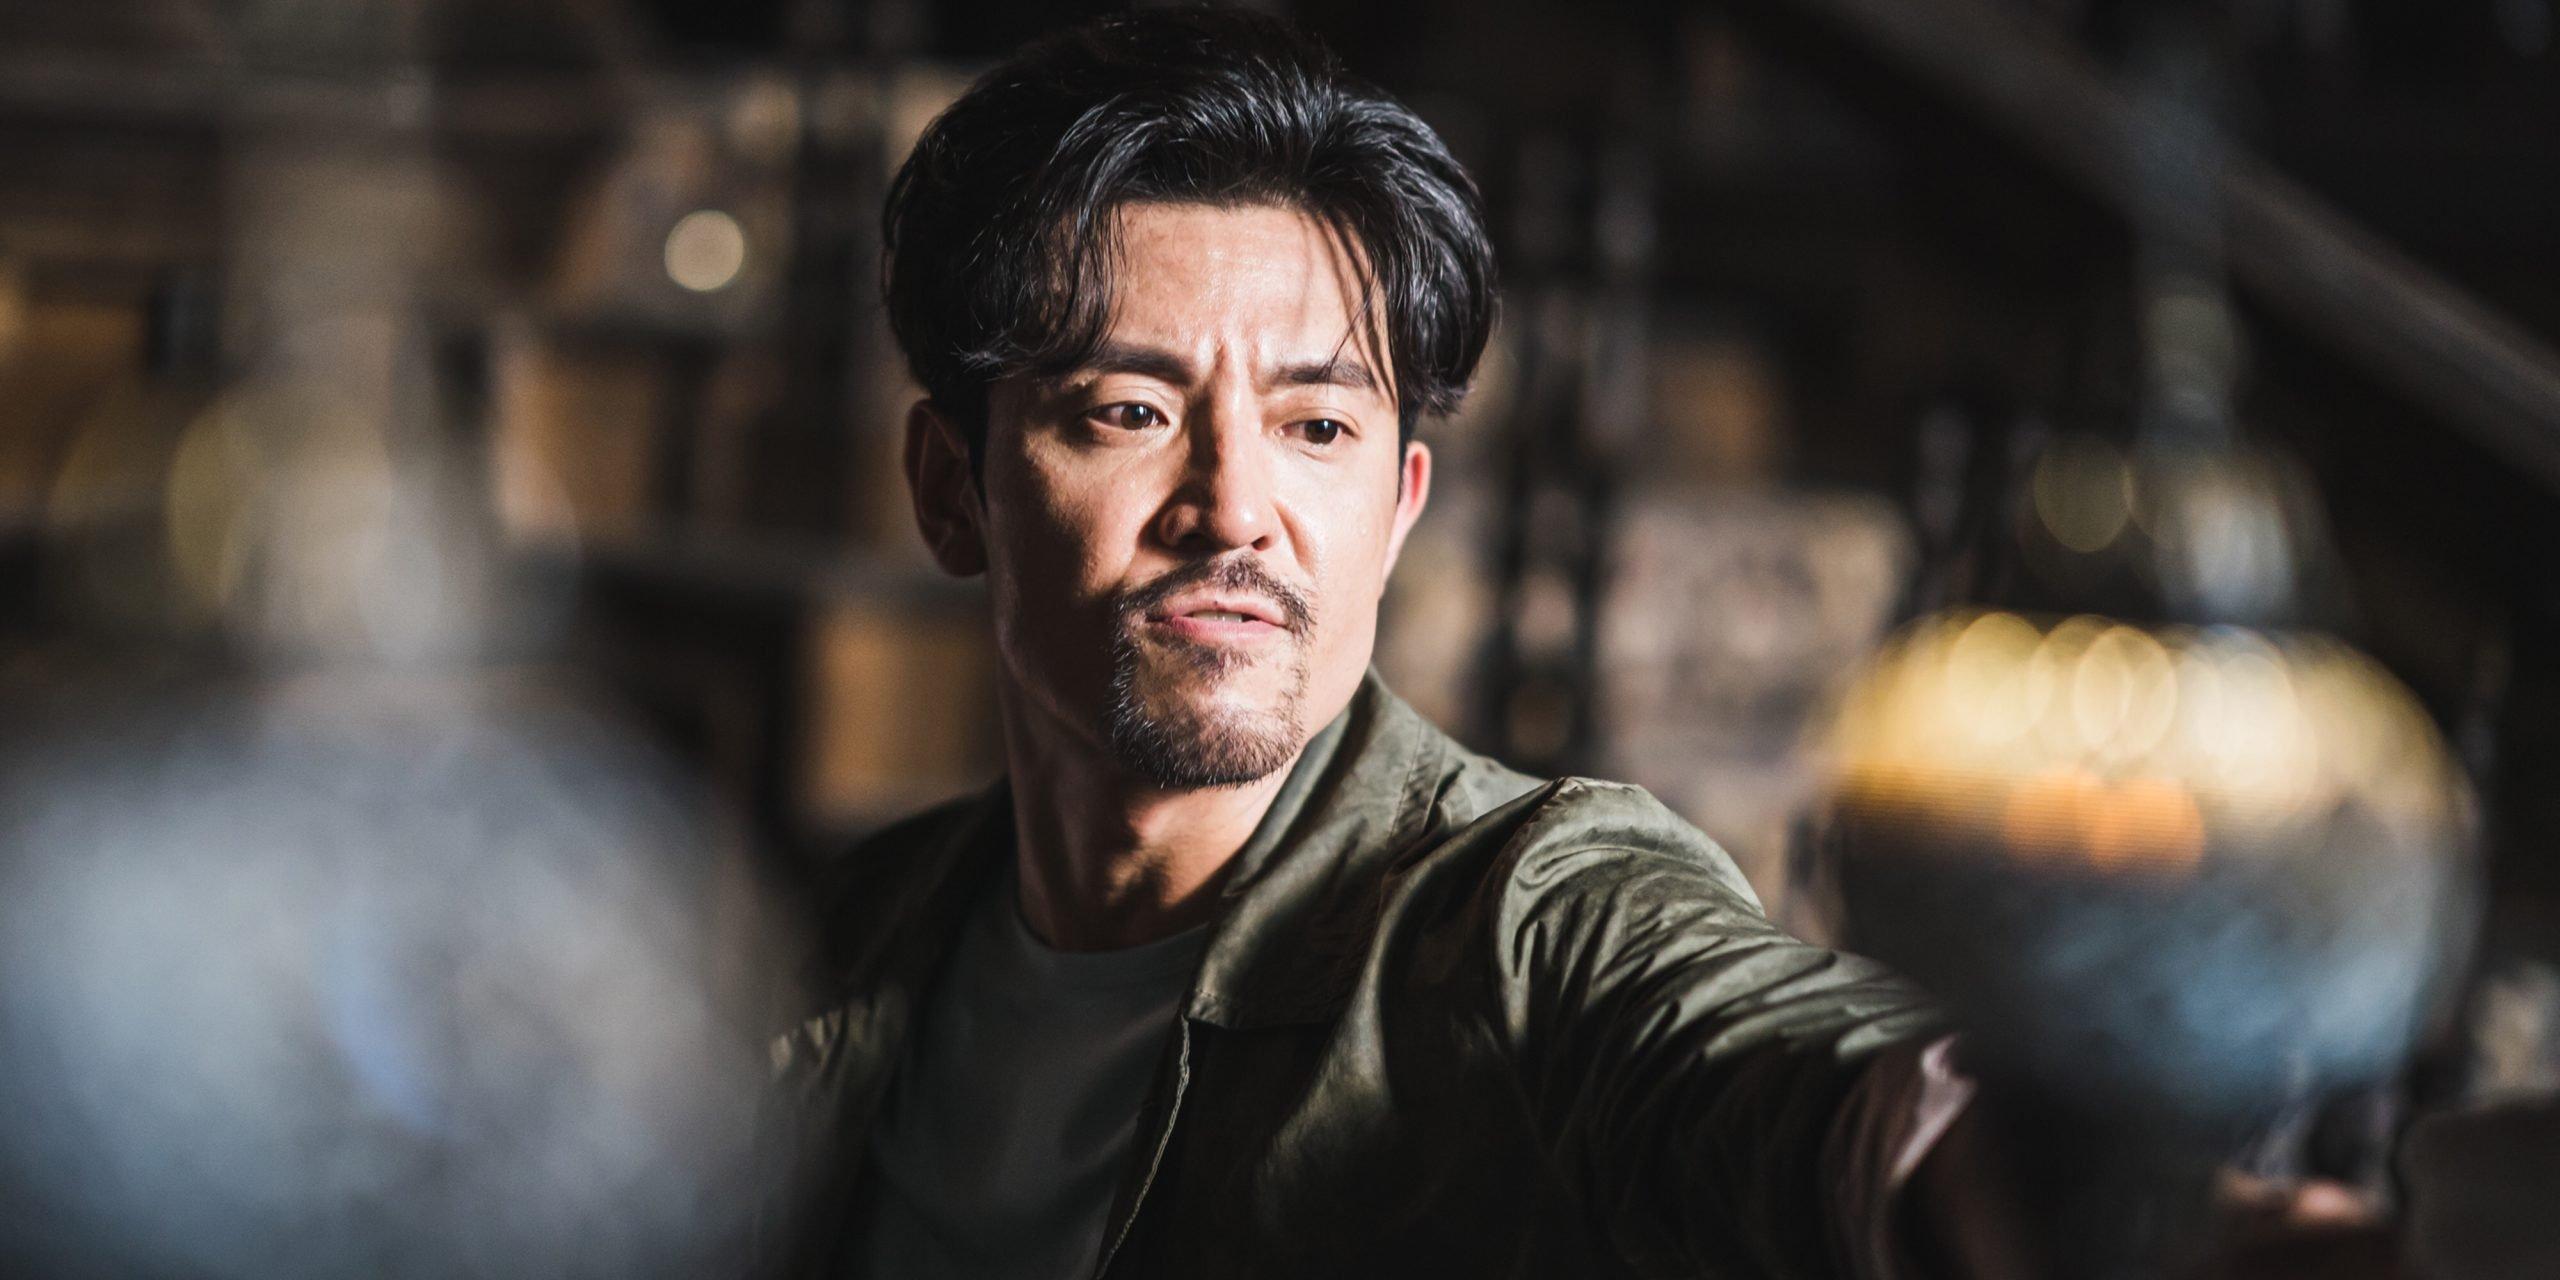 Kim Joo Hun(キム・ジュホン)のプロフィール❤︎【韓国俳優】